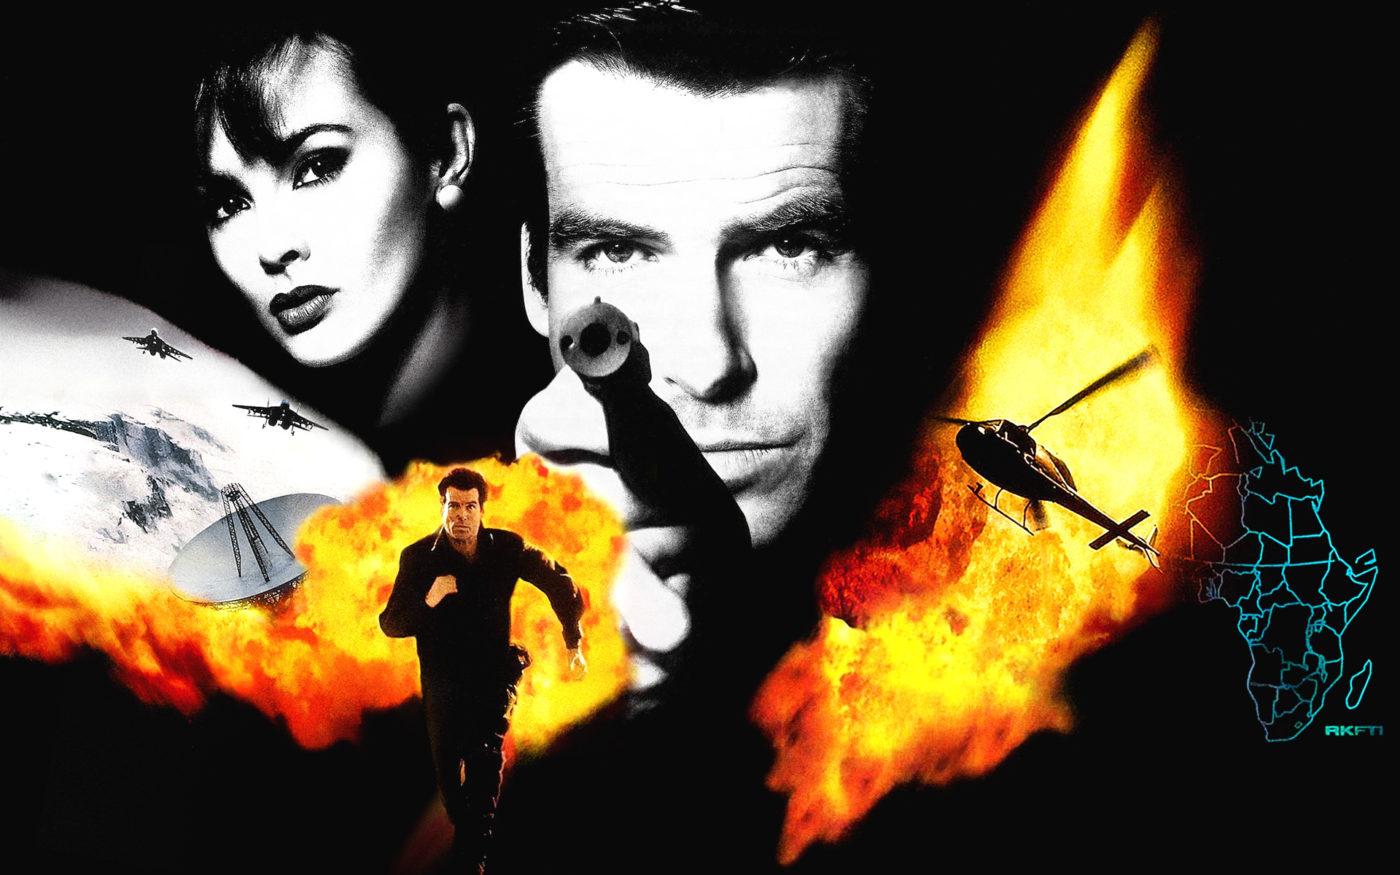 GoldenEye 007 Remaster Gameplay